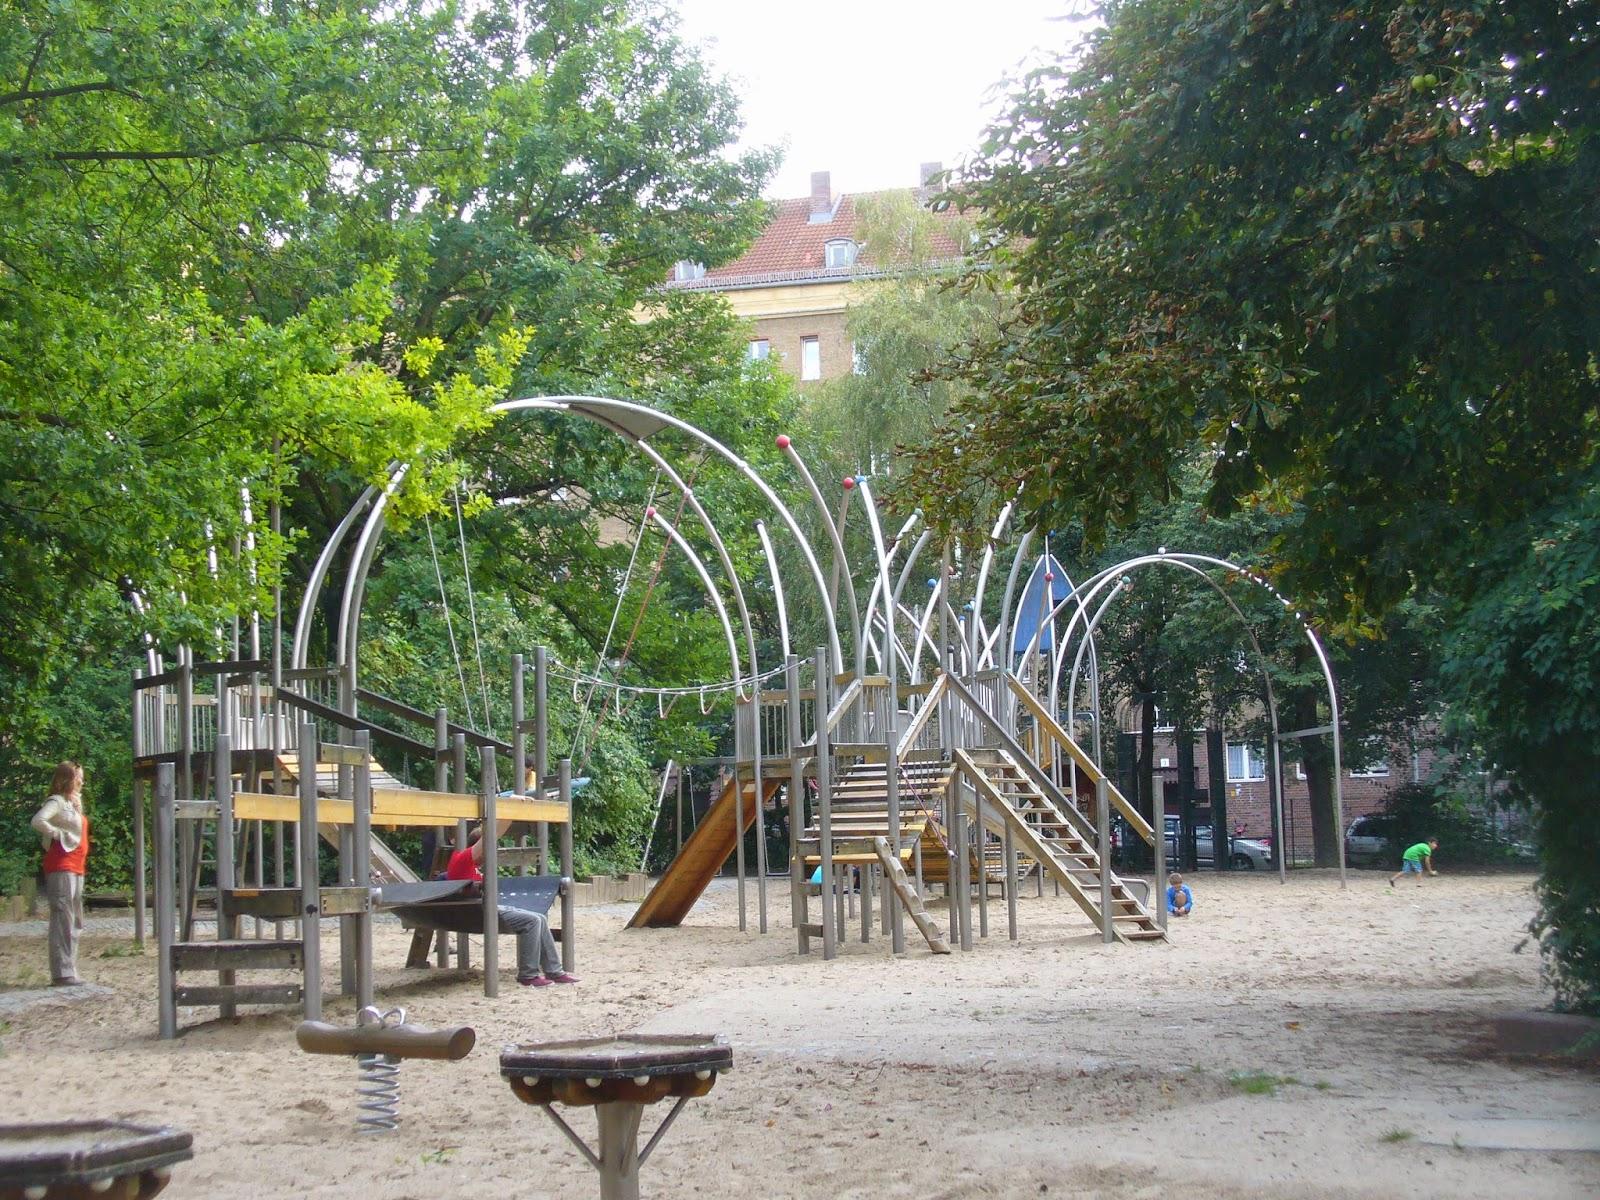 Fabuleux acasadiclara: A Berlino con i bambini - parchi gioco ovunque! LK08